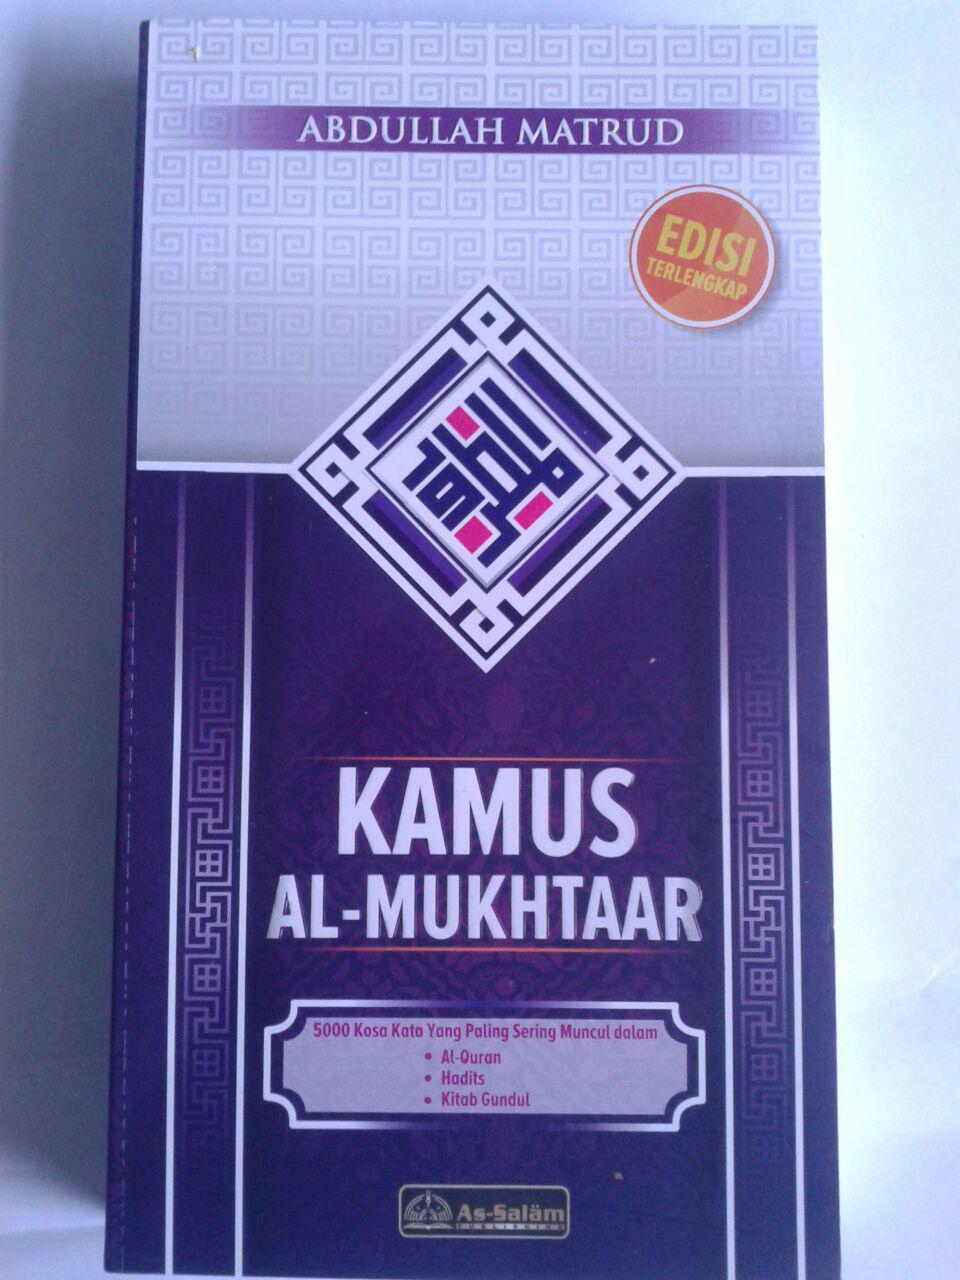 Buku Kamus Al-Mukhtaar 5000 Kosakata Yang Paling Sering Muncul cover 2